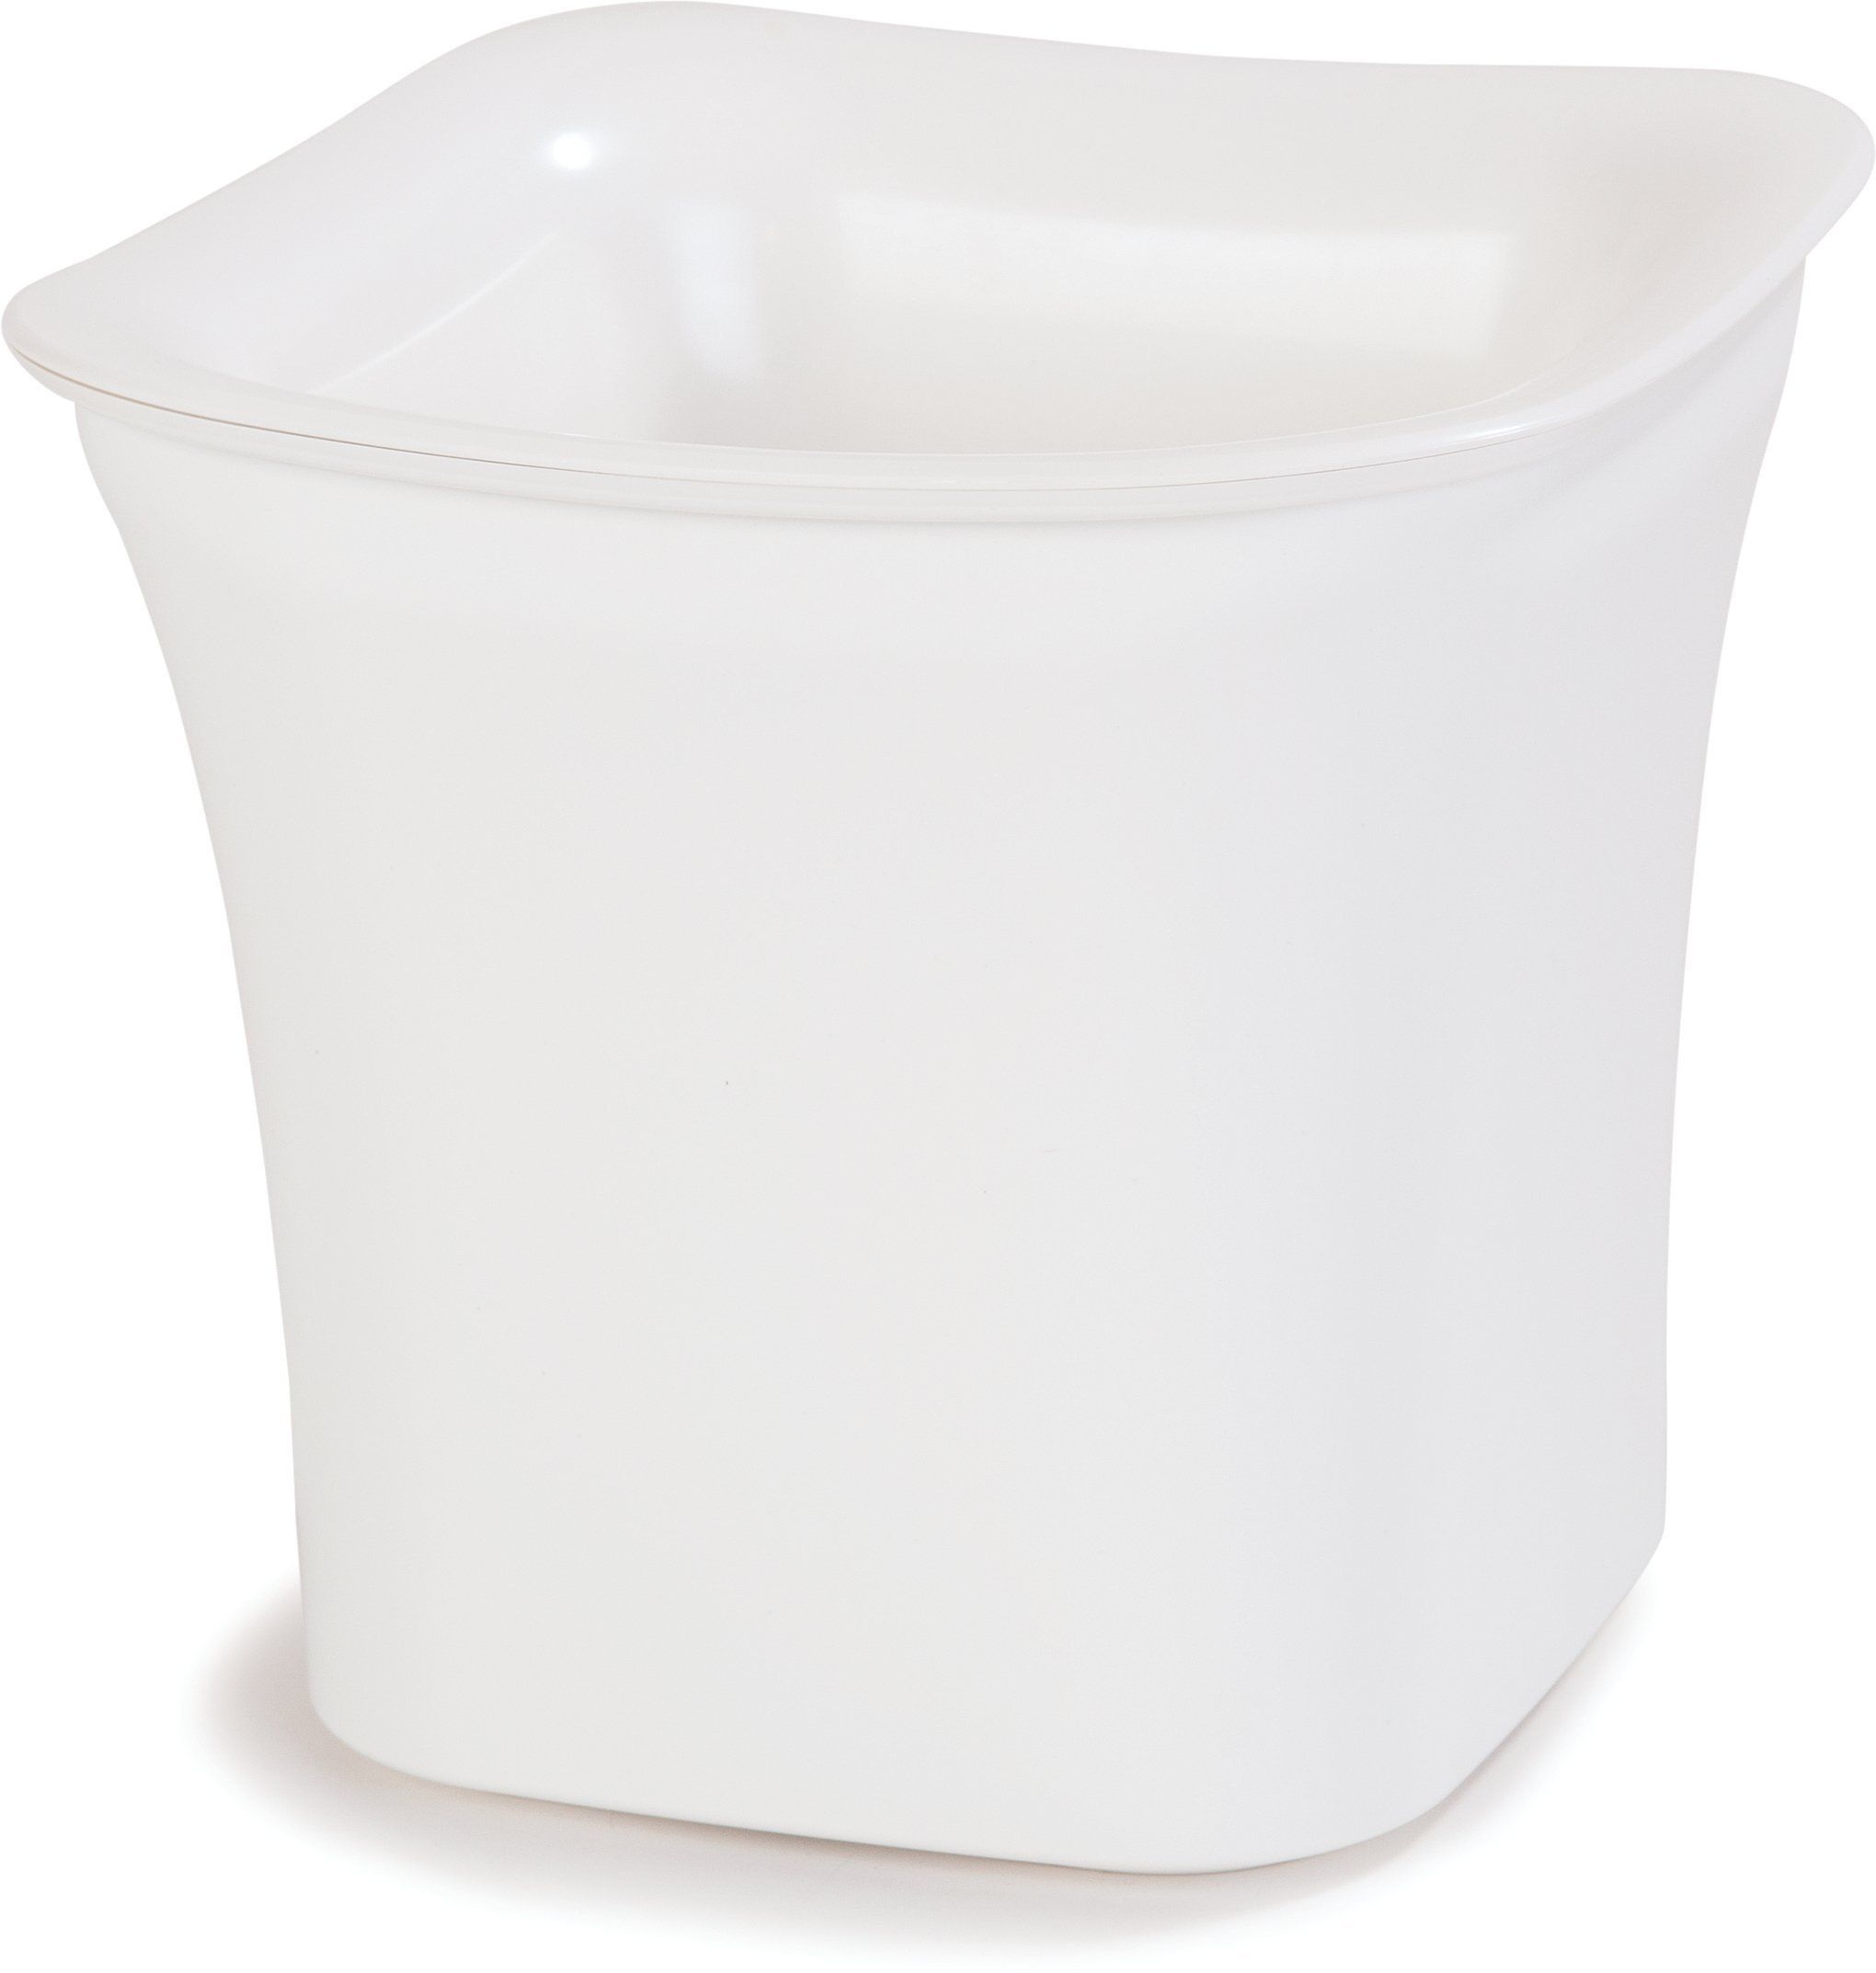 Carlisle CM140102 Coldmaster Insulated Square Serving Crock Only , 2 Quart, White